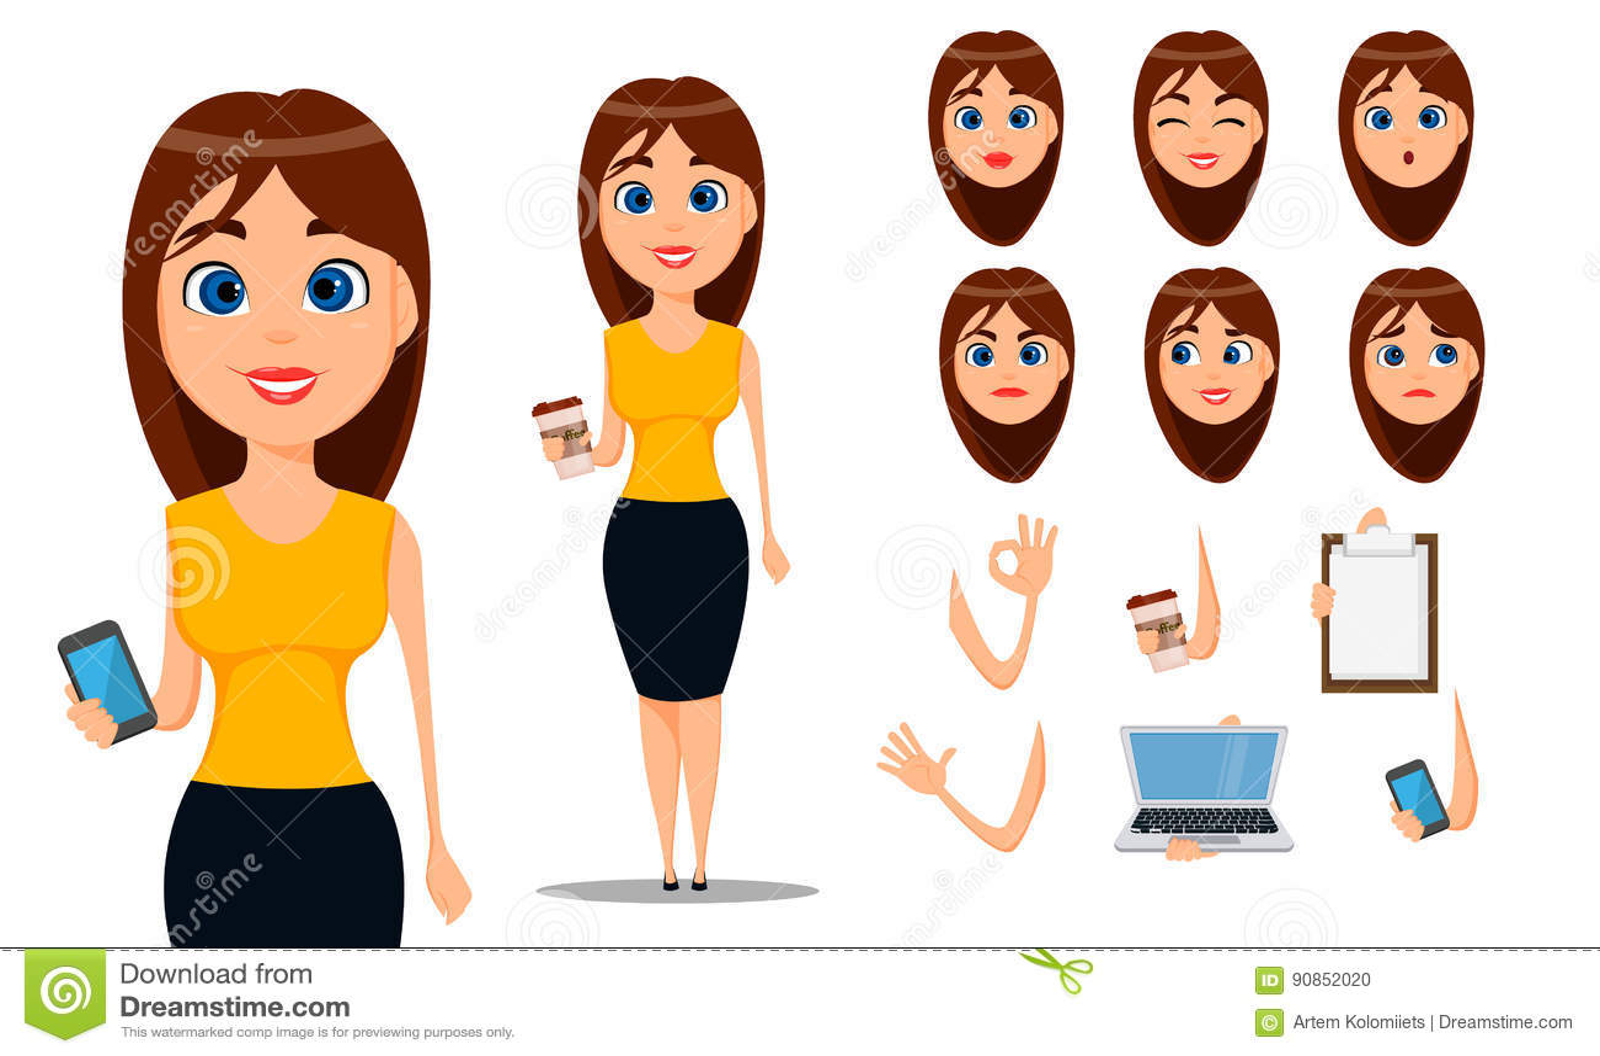 Businesswoman Creation Set Build Your Character Vector